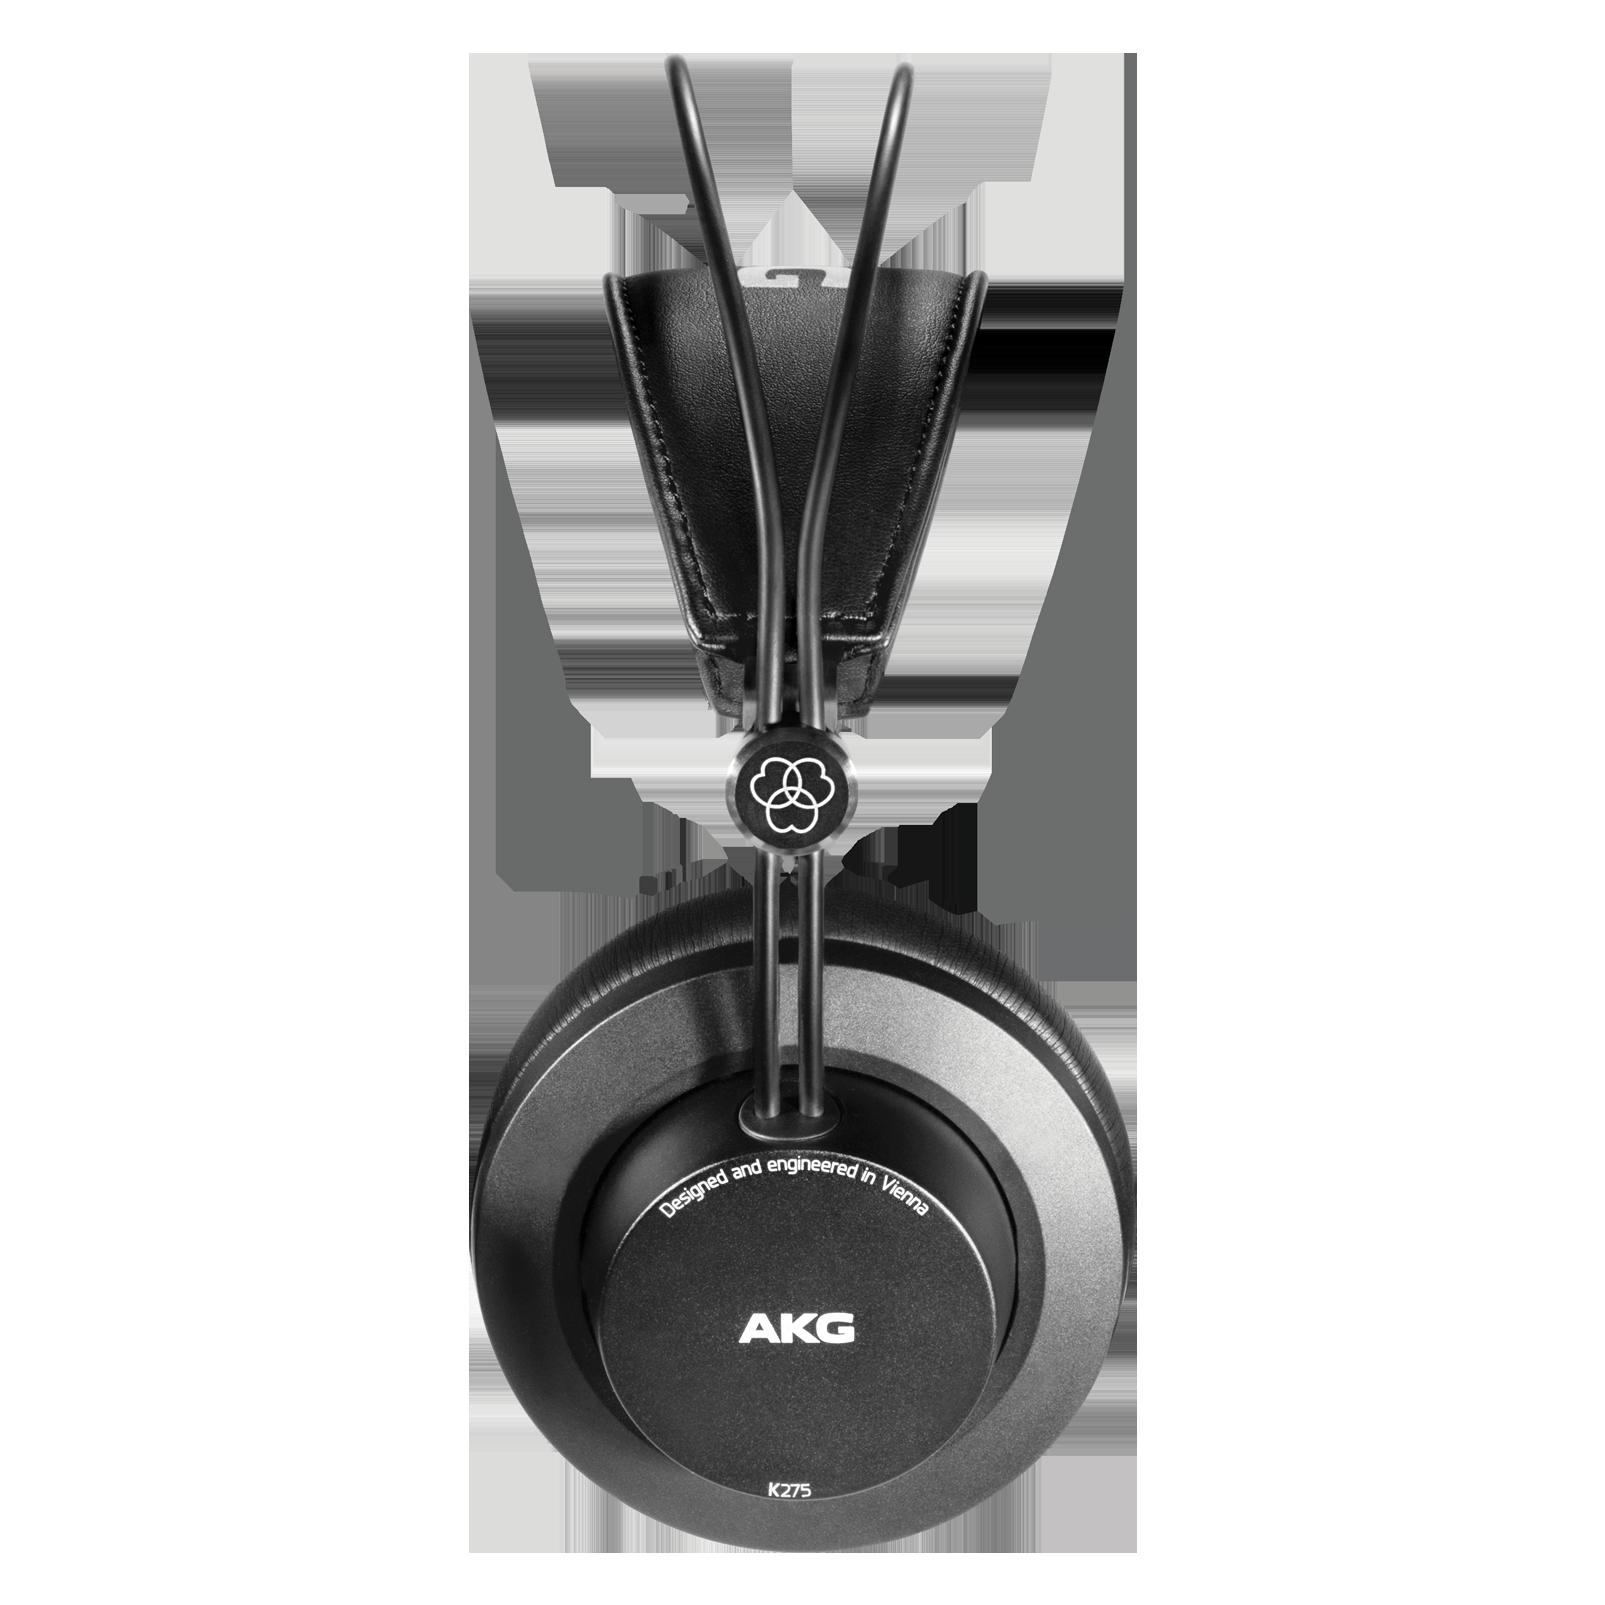 K275 - Black - Over-ear, closed-back, foldable studio headphones - Left